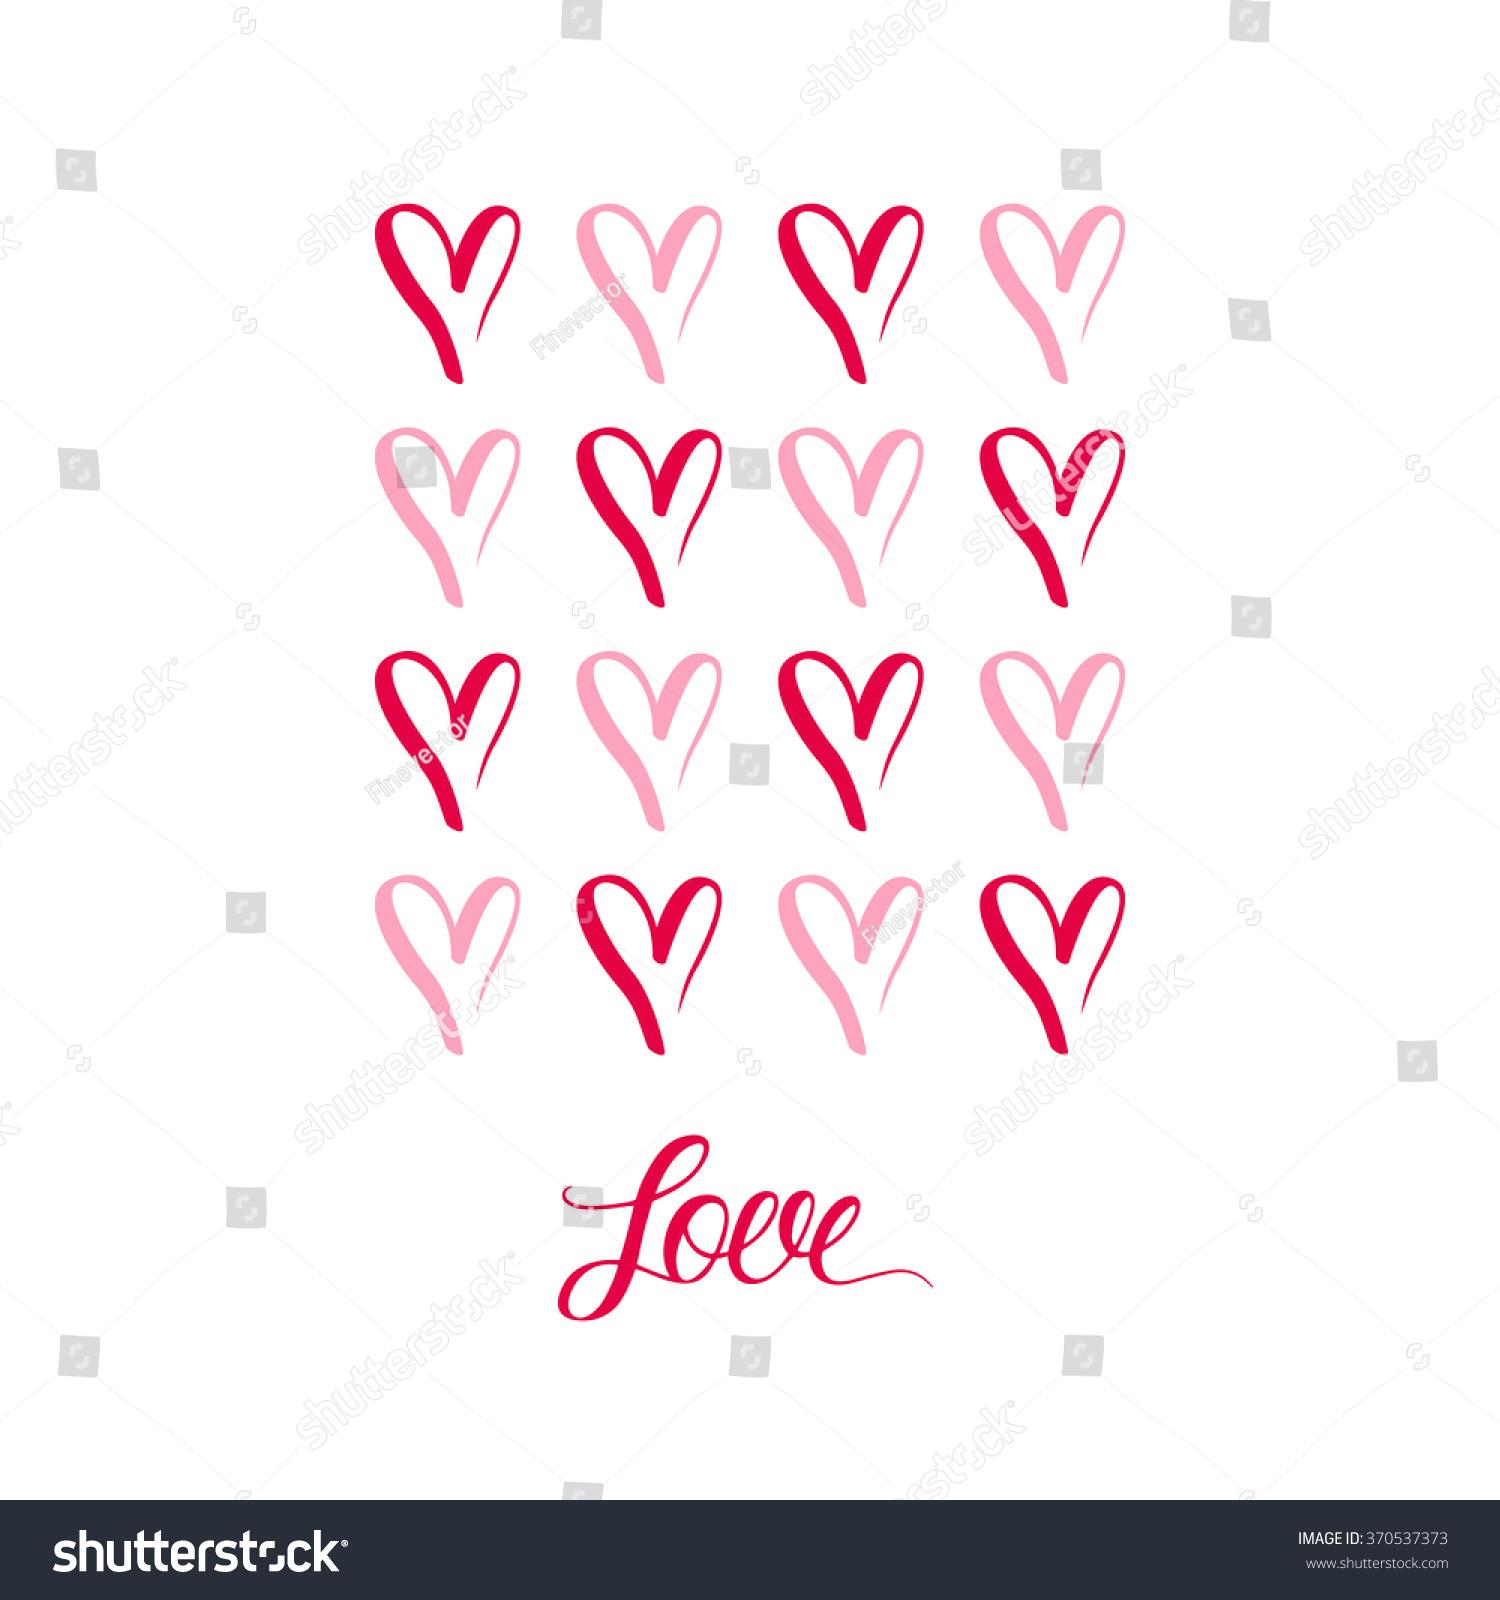 Hand drawn hearts symbols inscription love stock illustration hand drawn hearts symbols with inscription love design illustration biocorpaavc